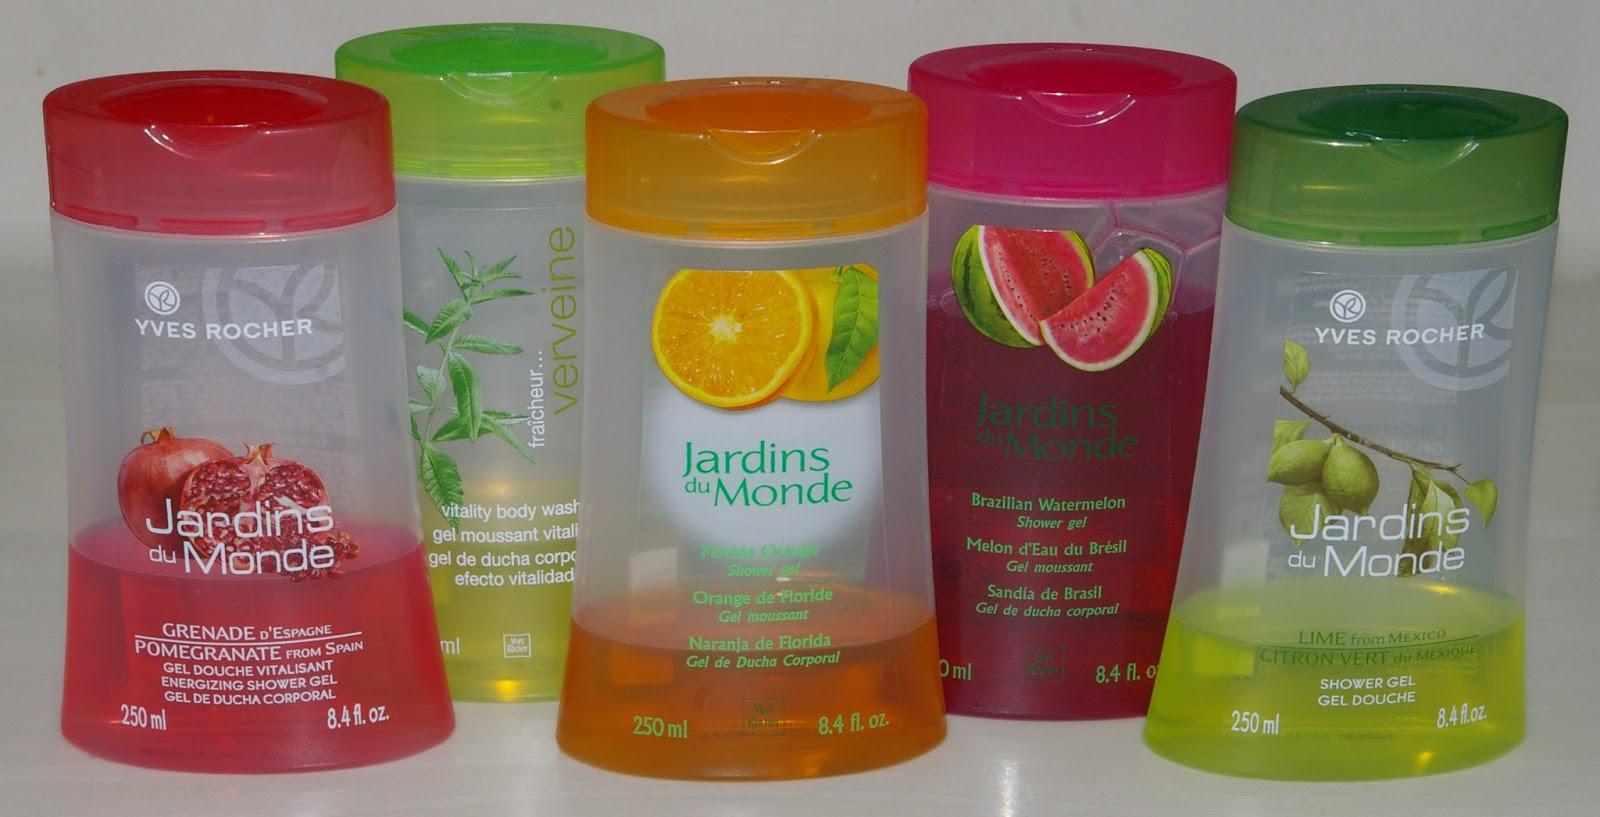 The polish jinx yves rocher jardins du monde shower gels for Jardin yves rocher